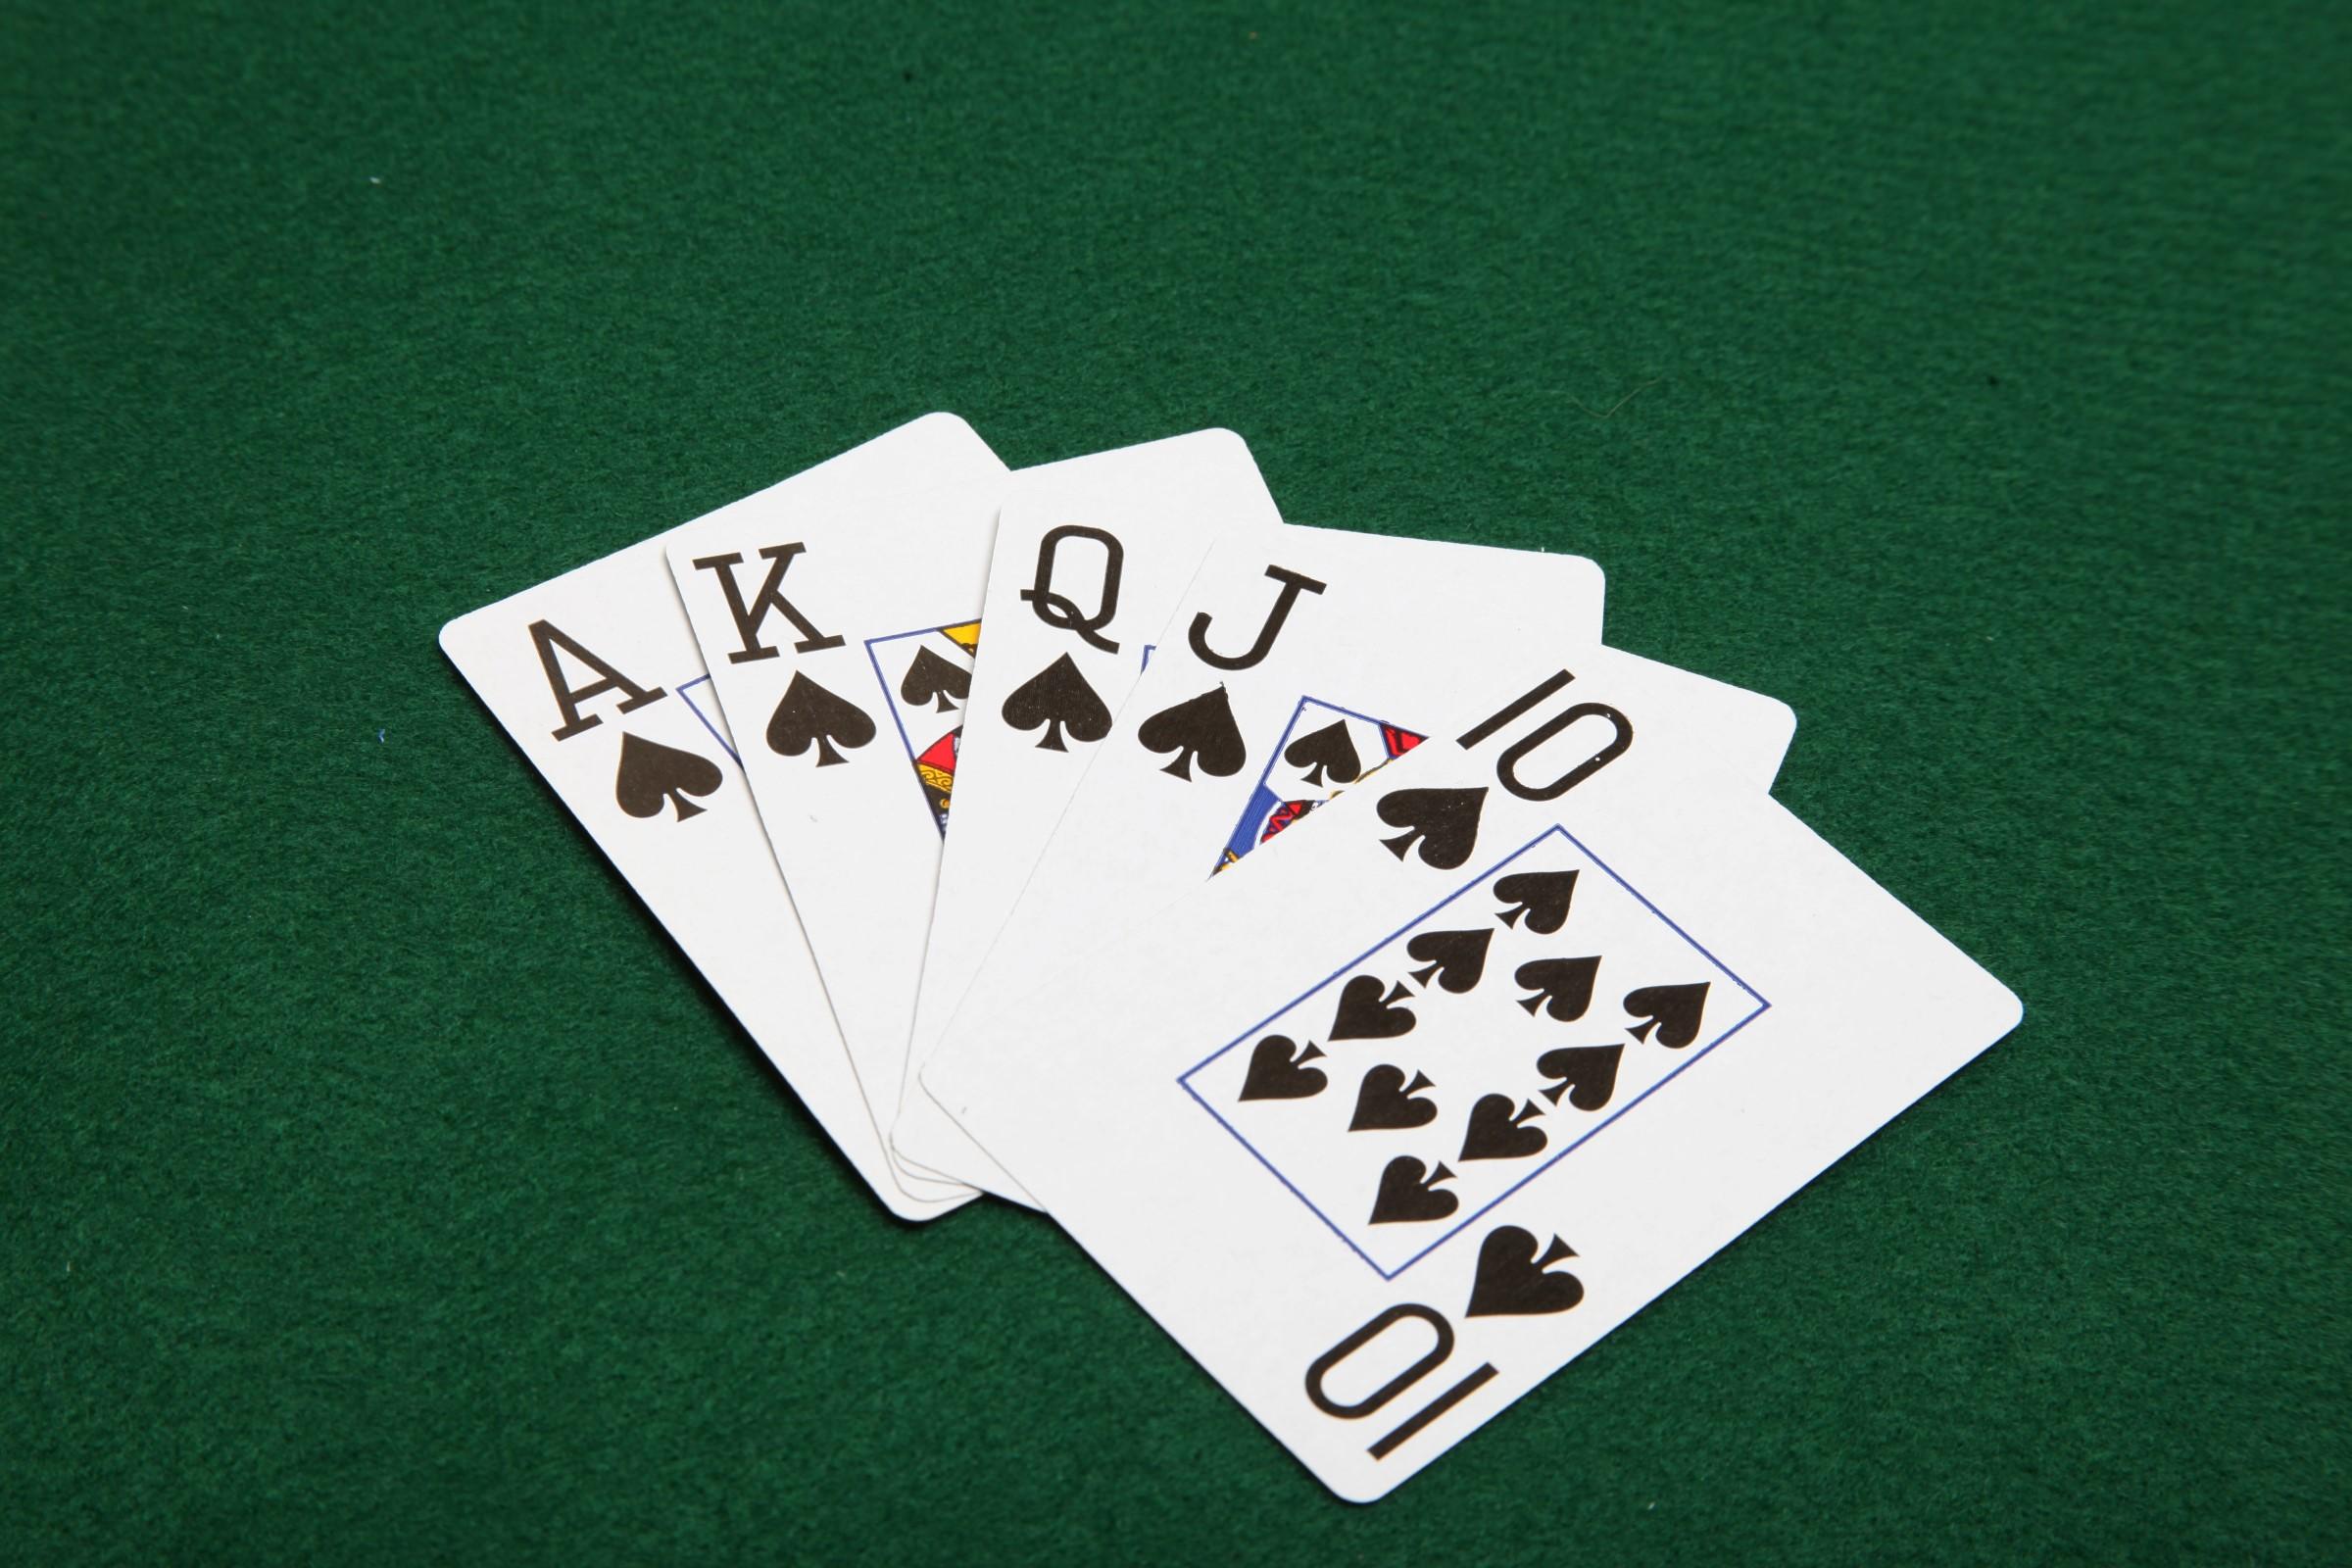 Free high flush poker walking dead slot machine payout